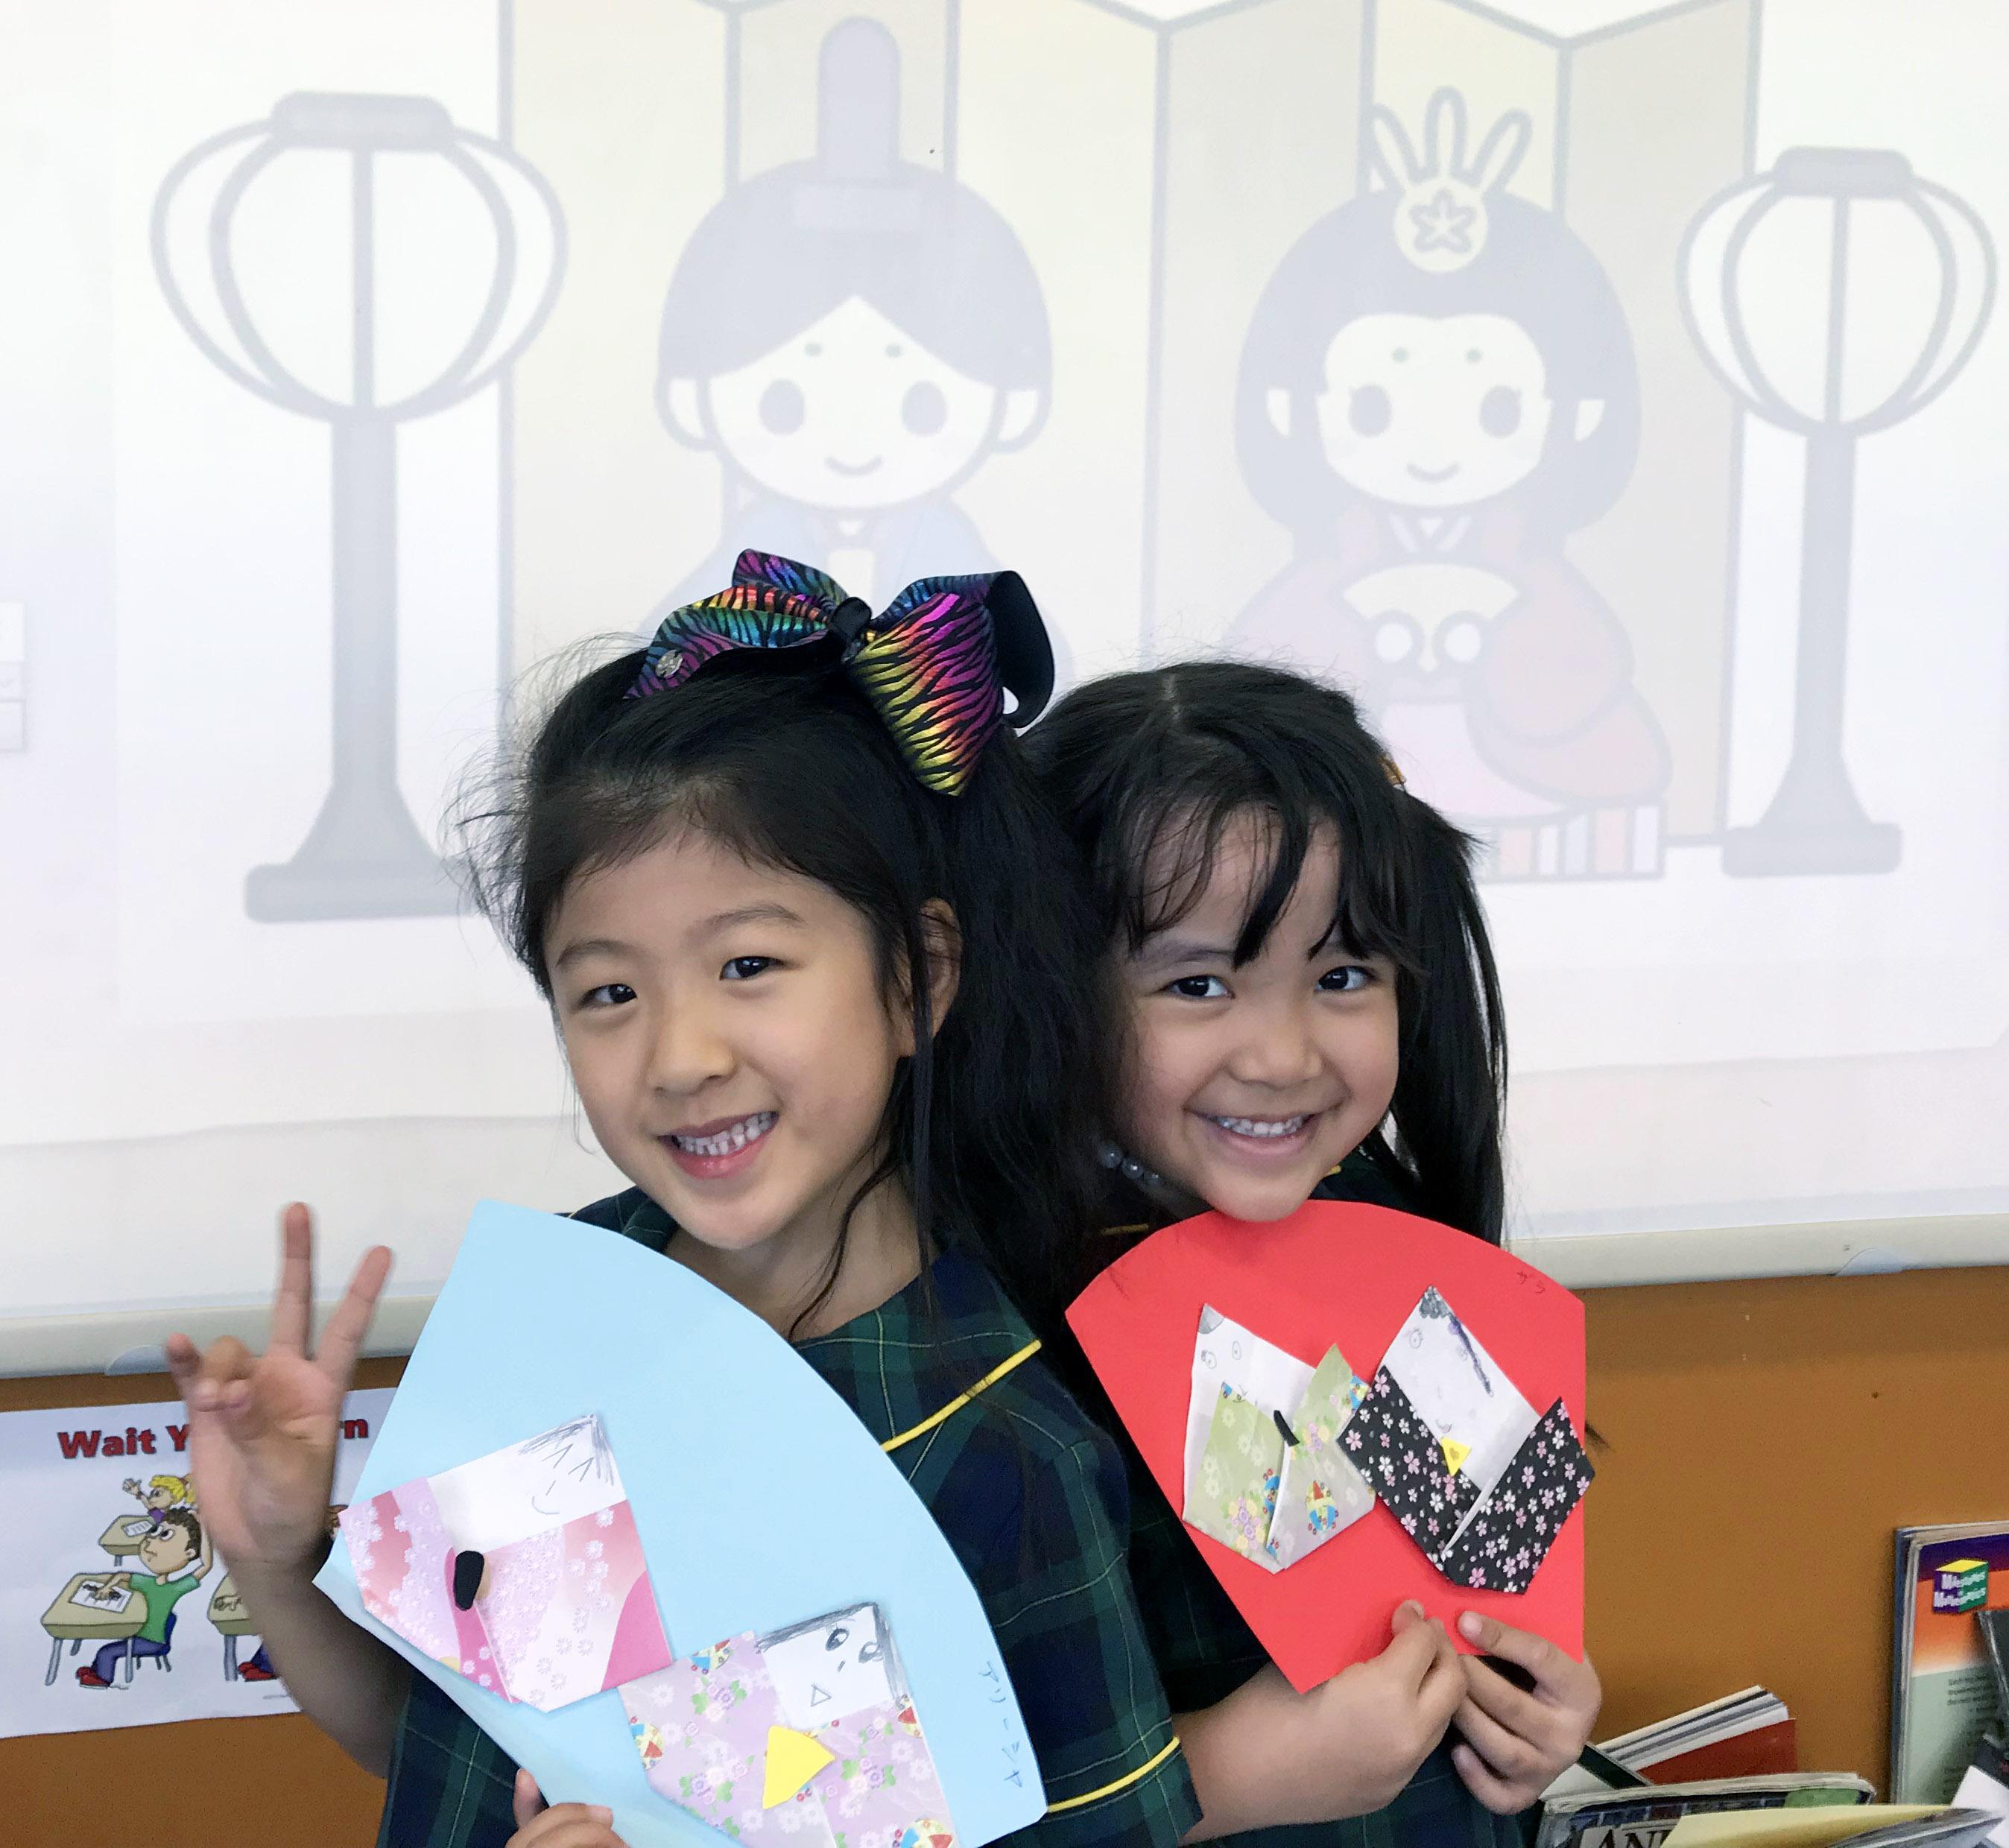 igs-year-1-japanese-doll-festival-art-display